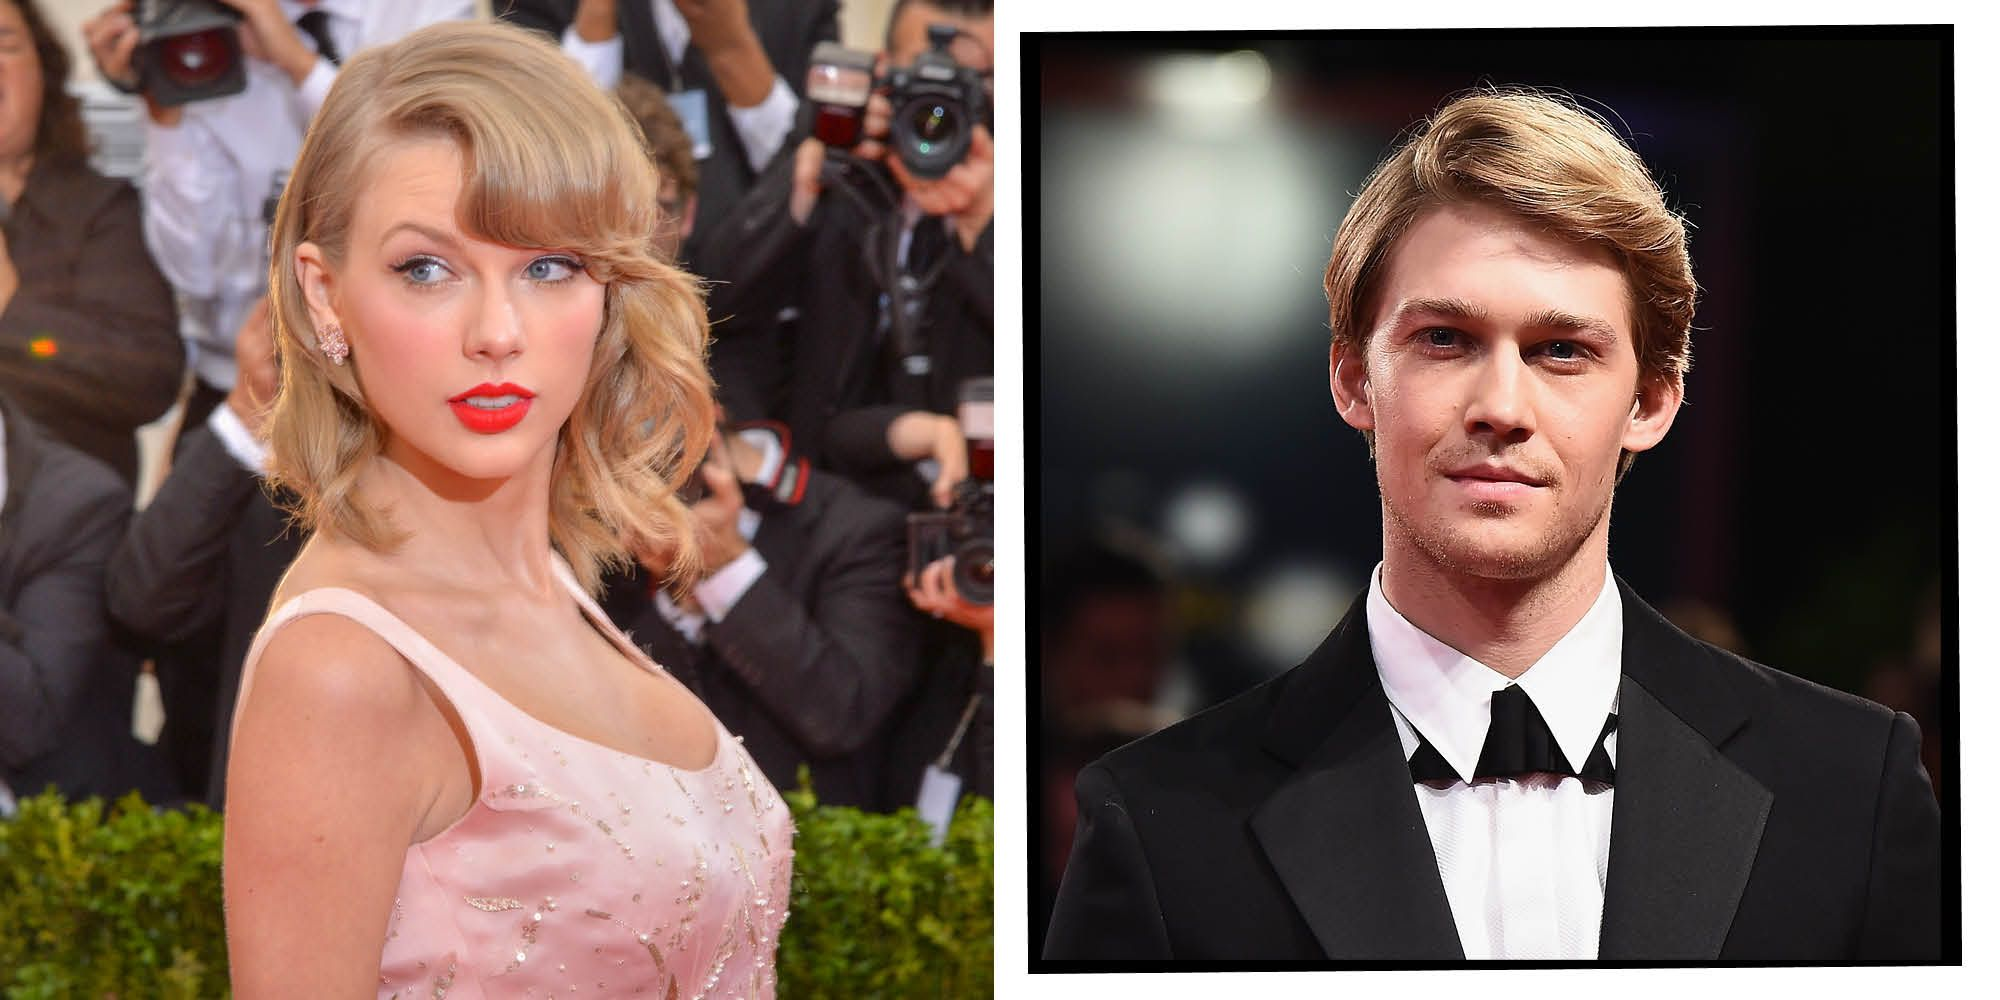 Everything Taylor Swift Has Told Us About Joe Alwyn Through Her 'Lover' Album Lyrics